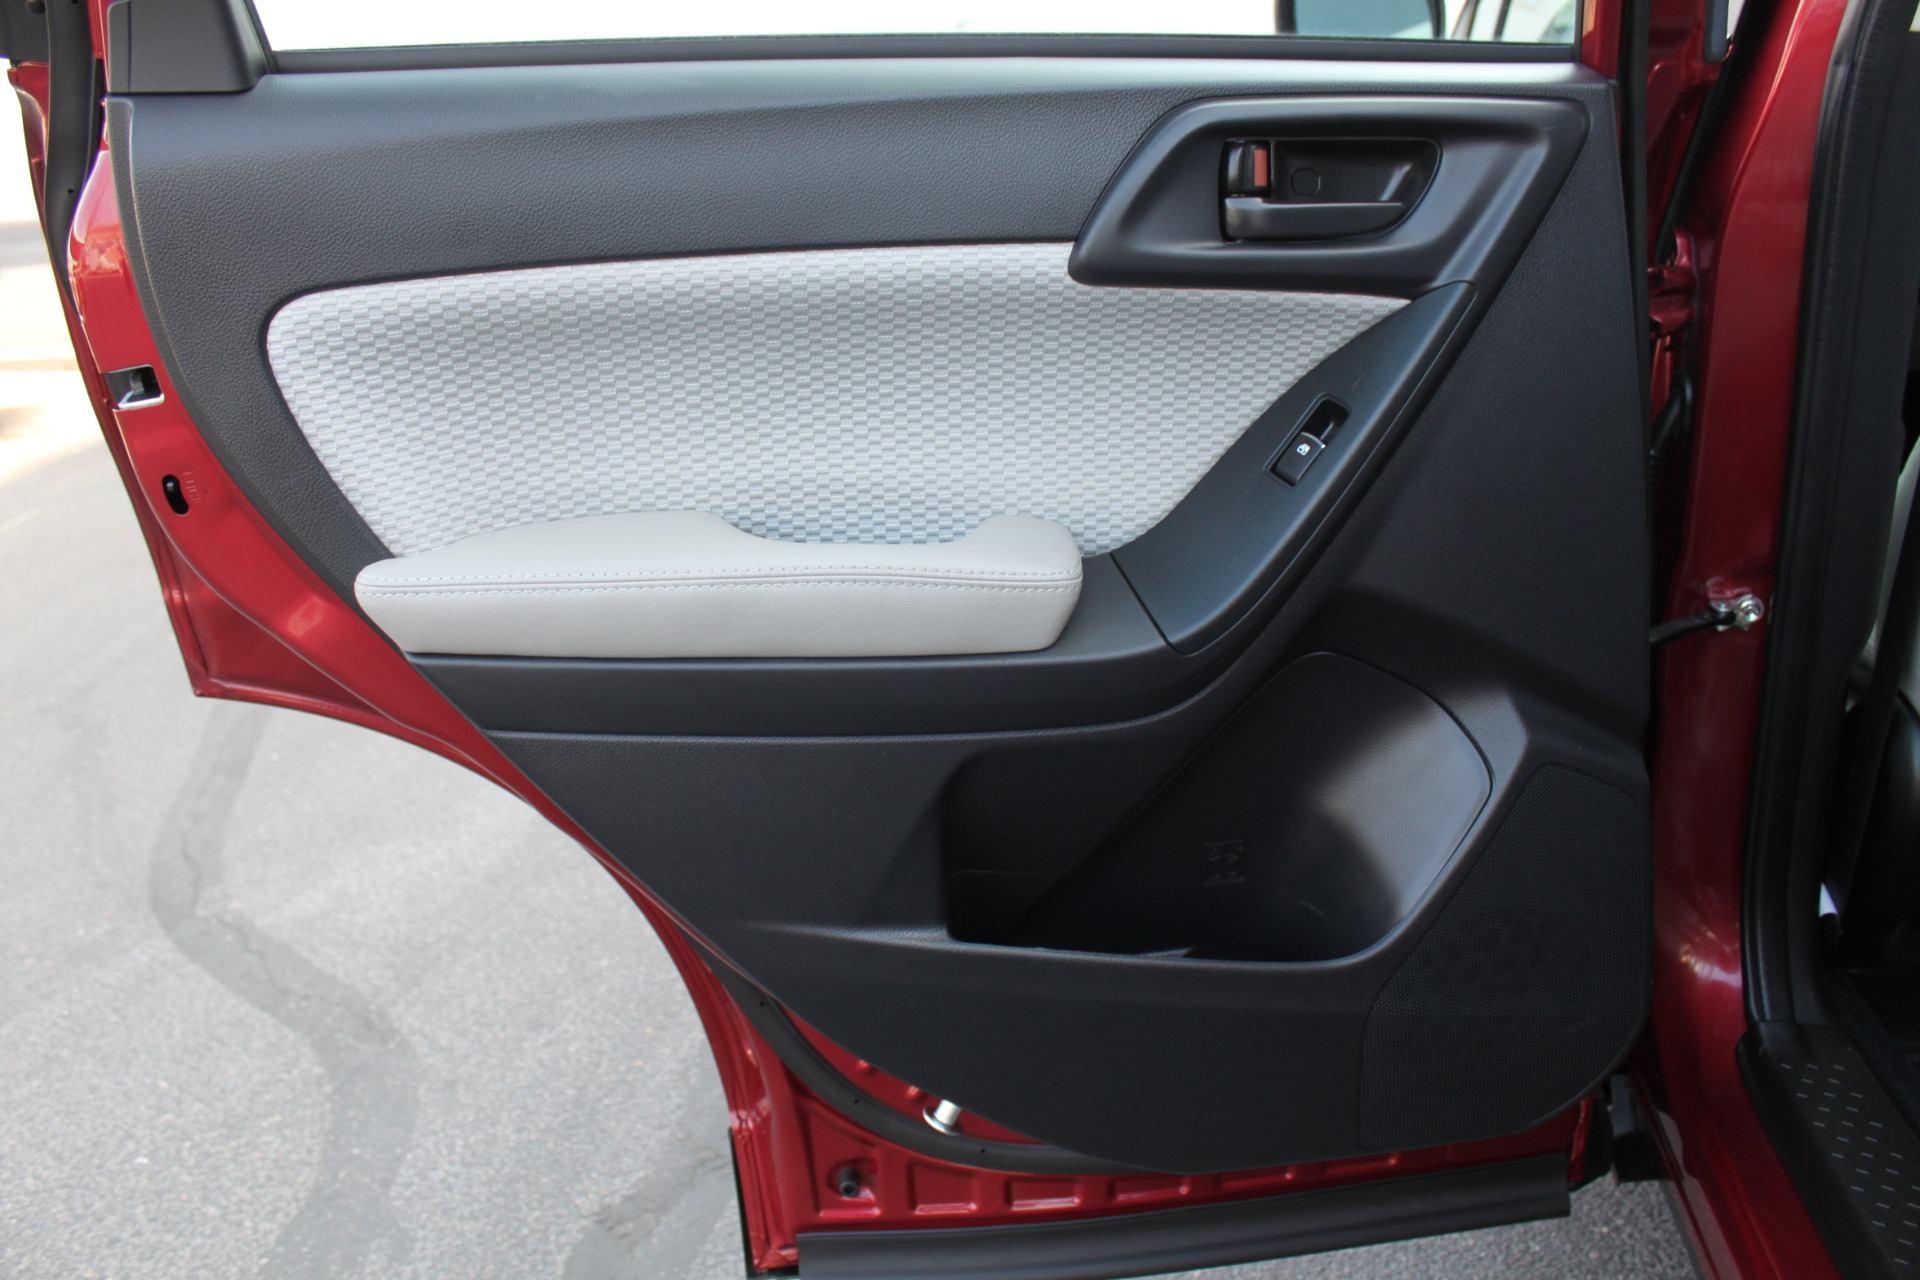 Used-2017-Subaru-Forester-25i-All-Wheel-Drive-25i-Grand-Cherokee